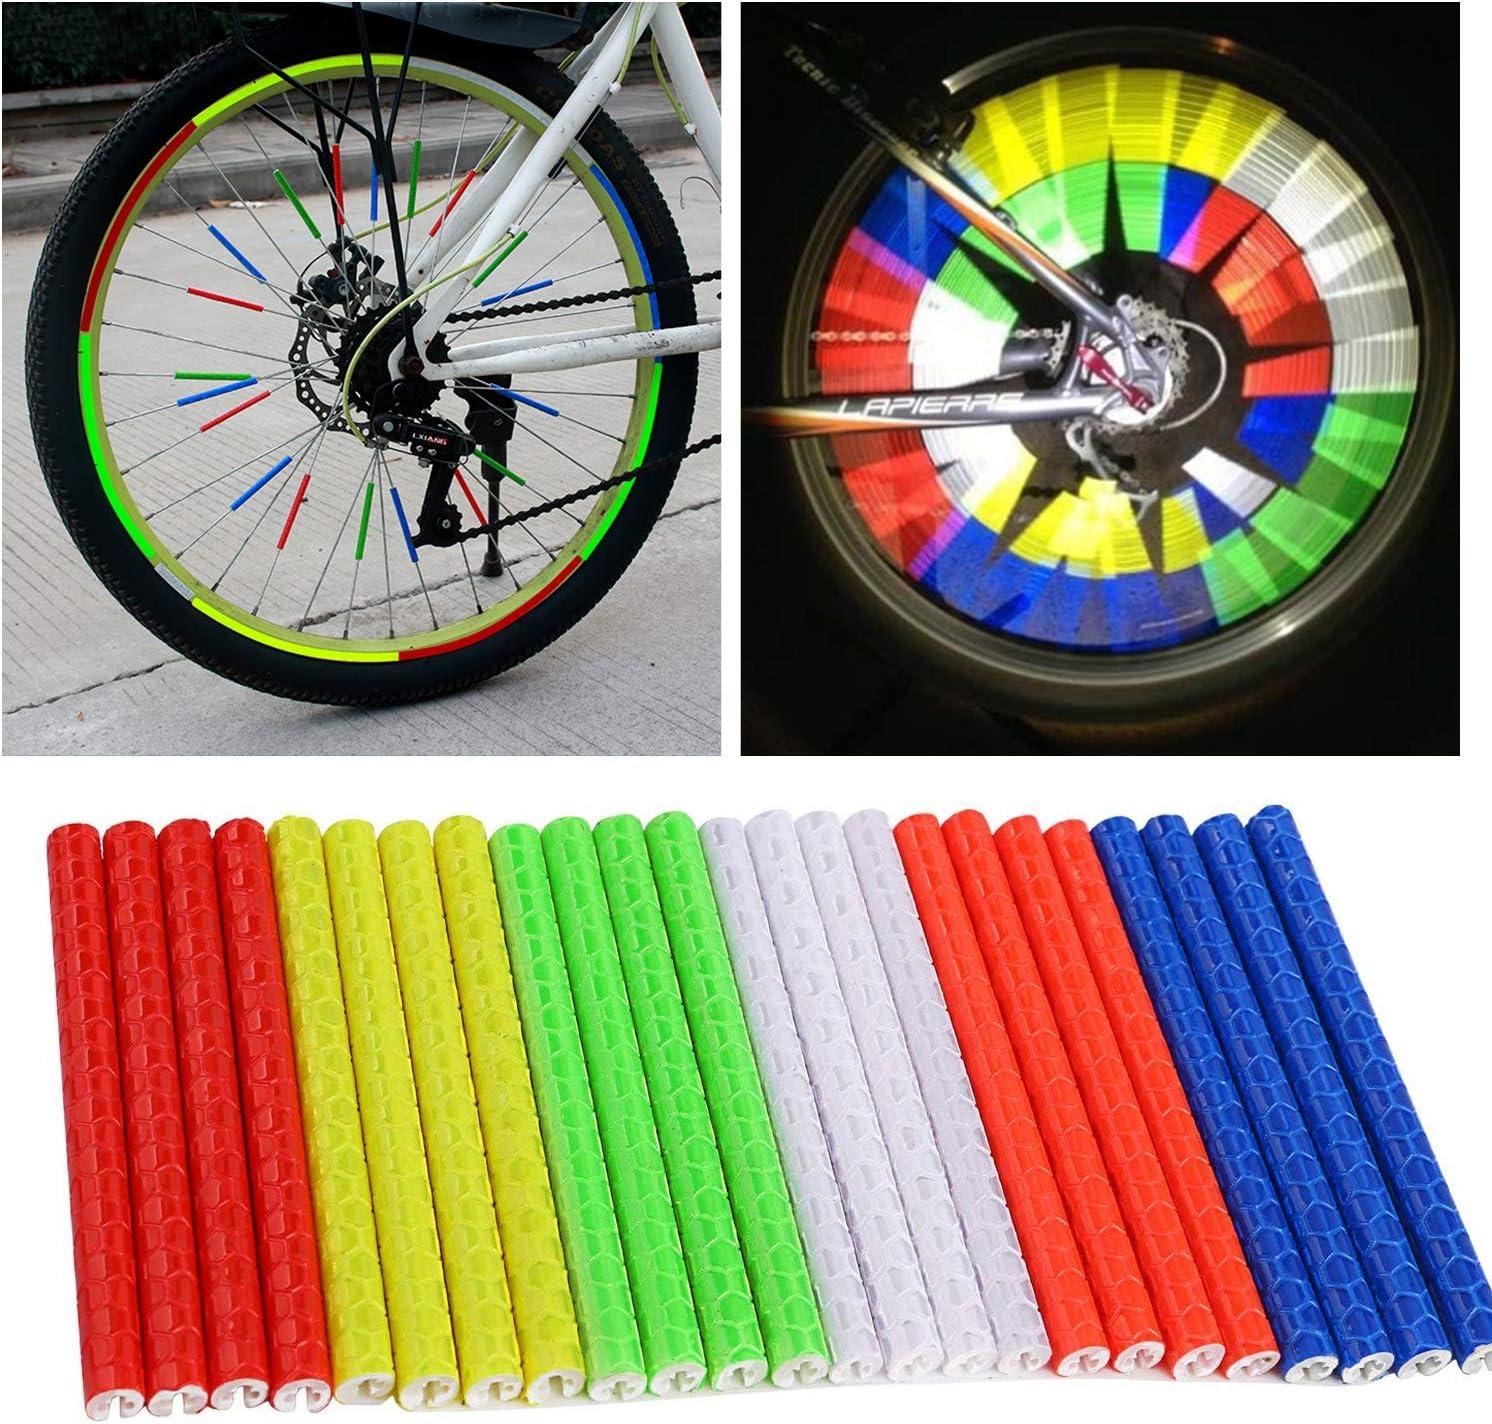 1 Set Bike Spoke Bike Wheel Spoke Reflector Universal Bike Skins Wraps Warning